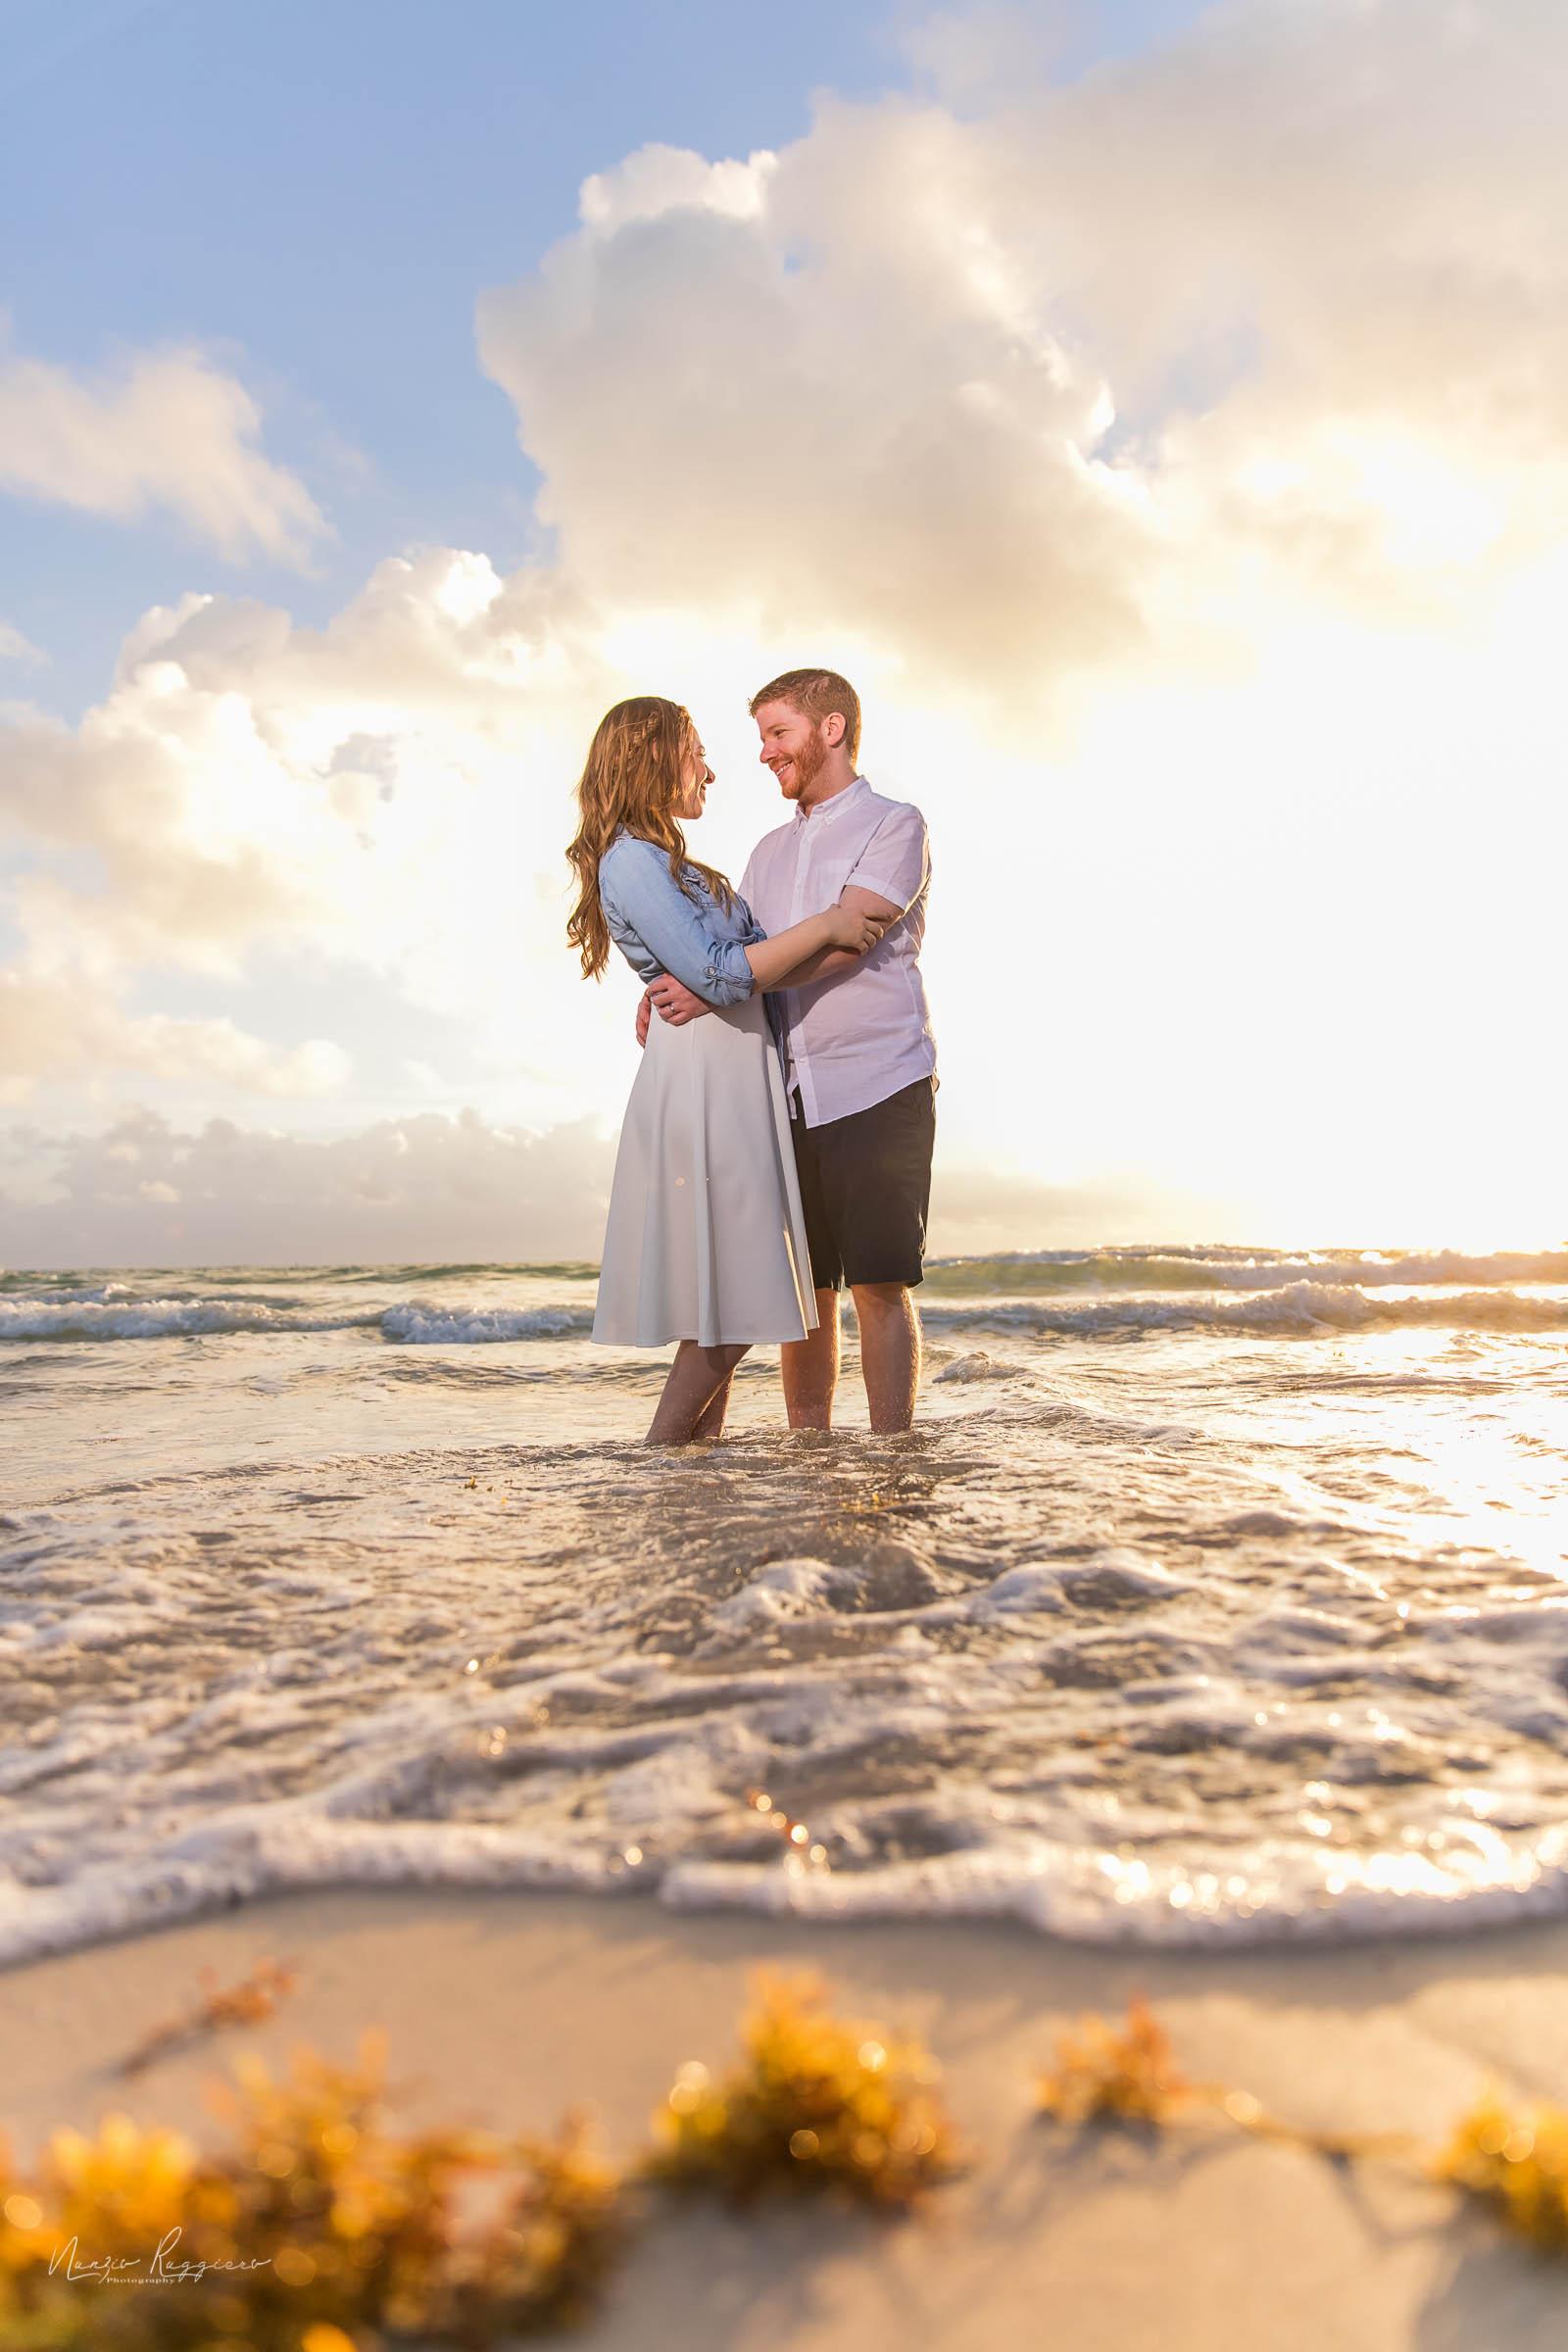 Engagement Photographer in Miami